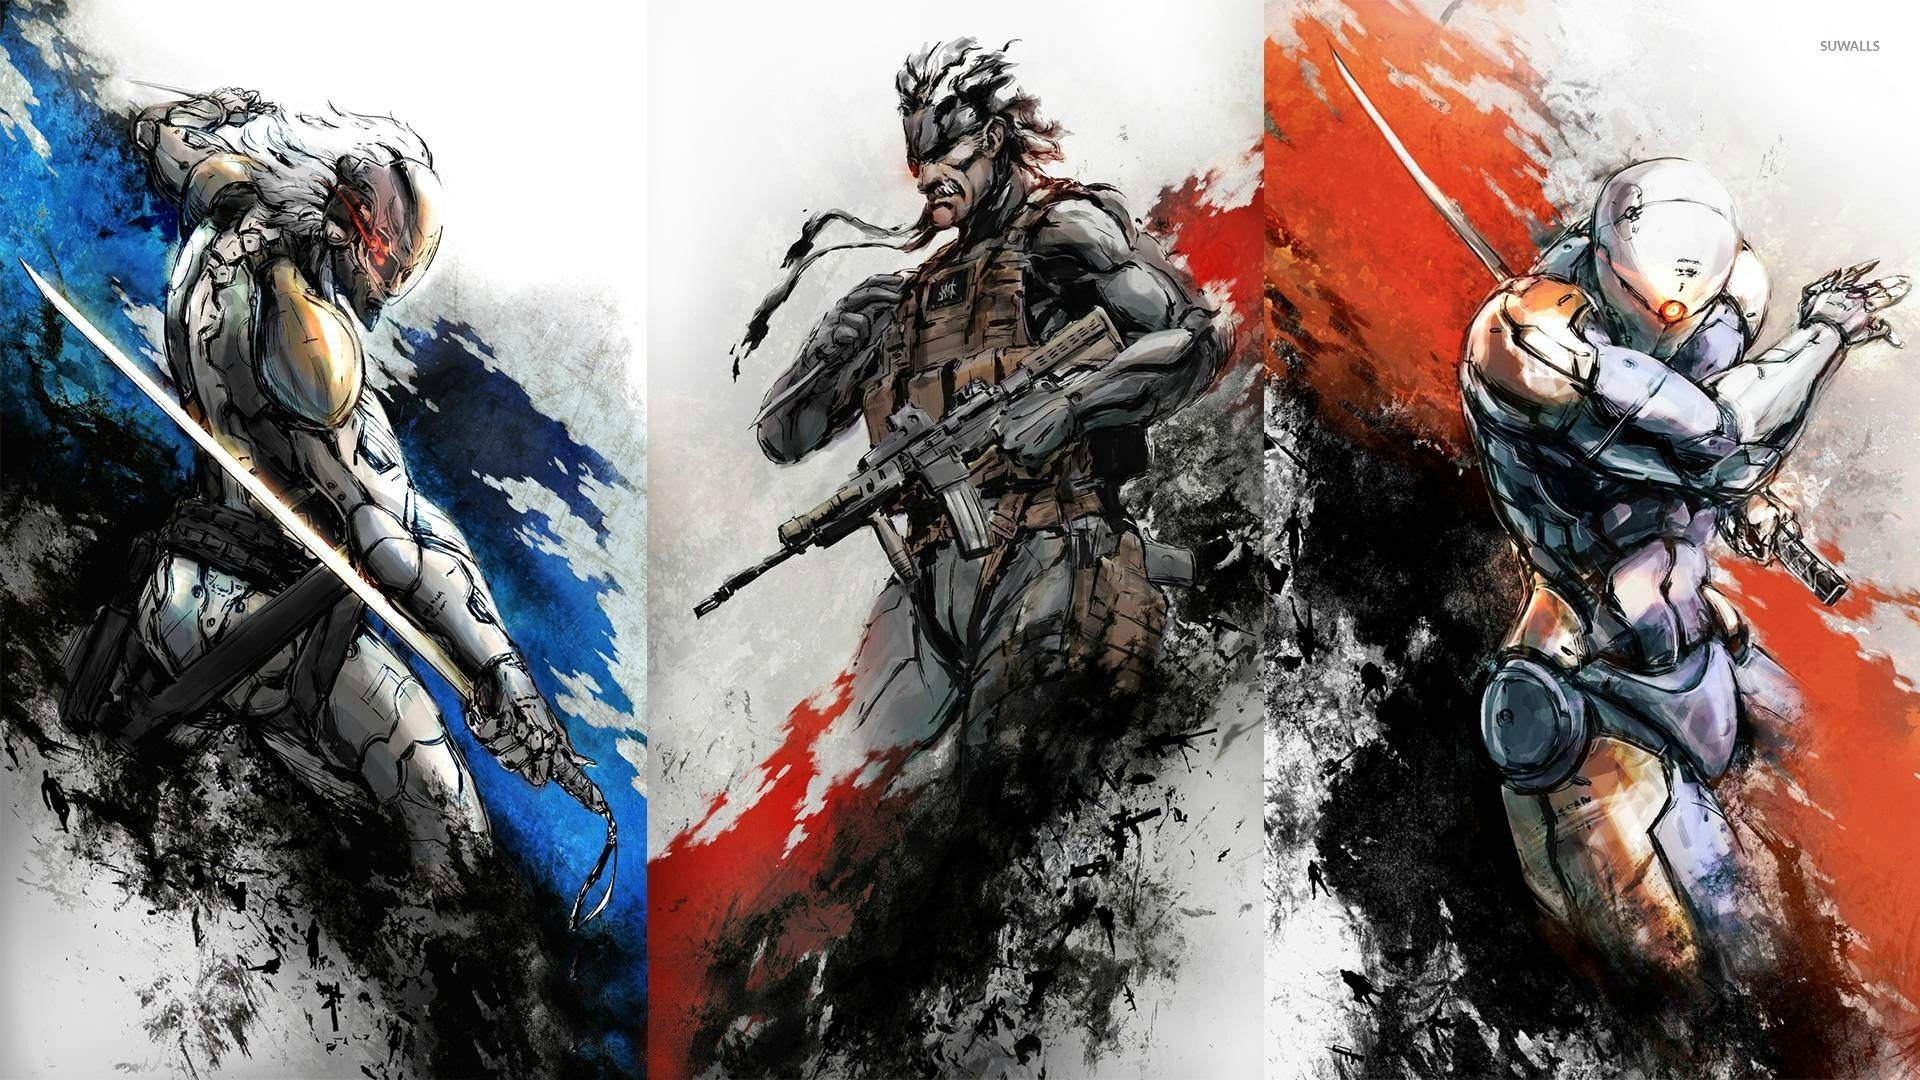 Metal Gear Solid wallpapers HD Wallpapers Pinterest Metal